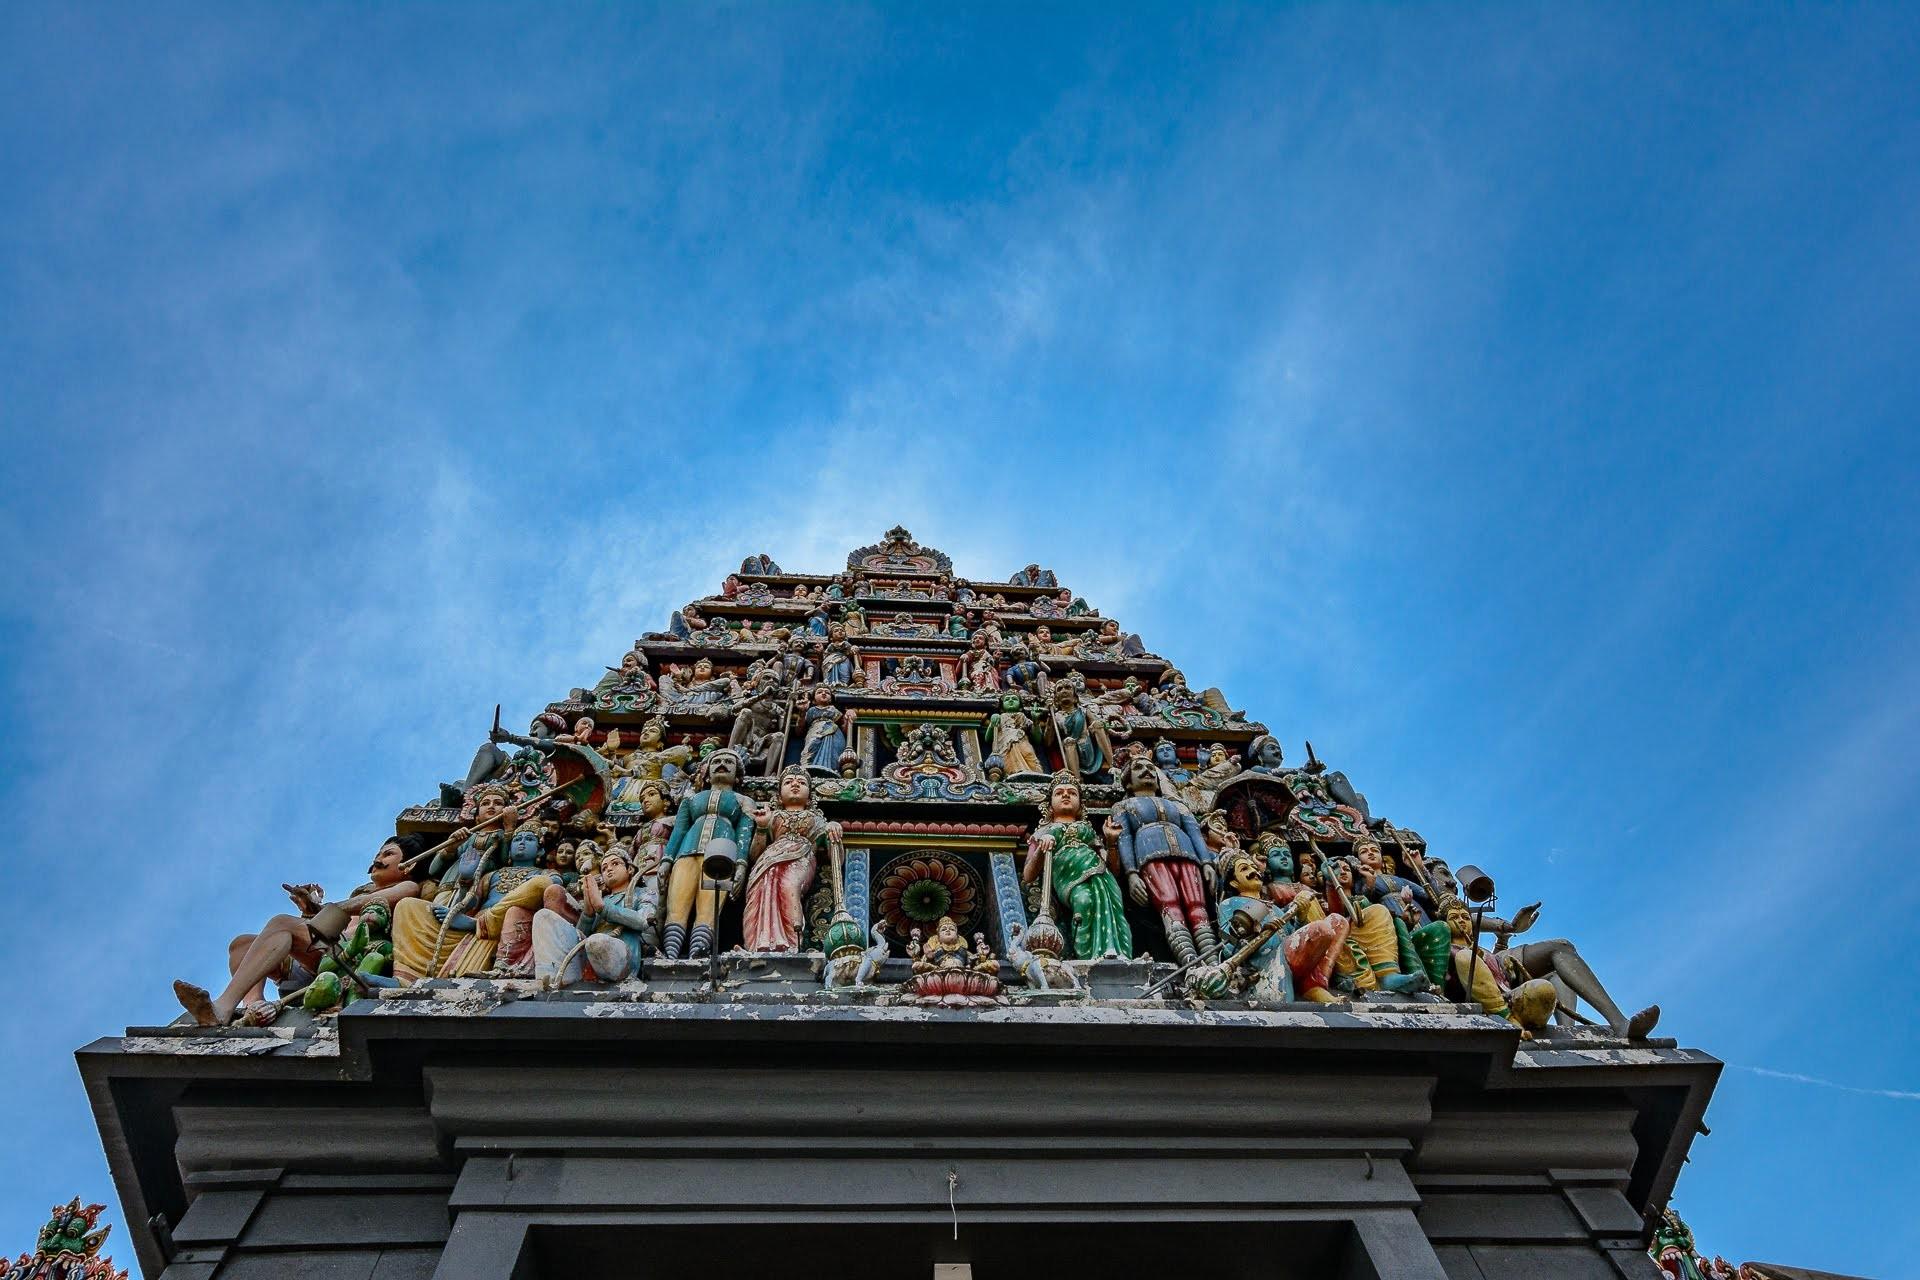 Sri Mariamman Temple - Malajsie cestopis, Martin Šístek